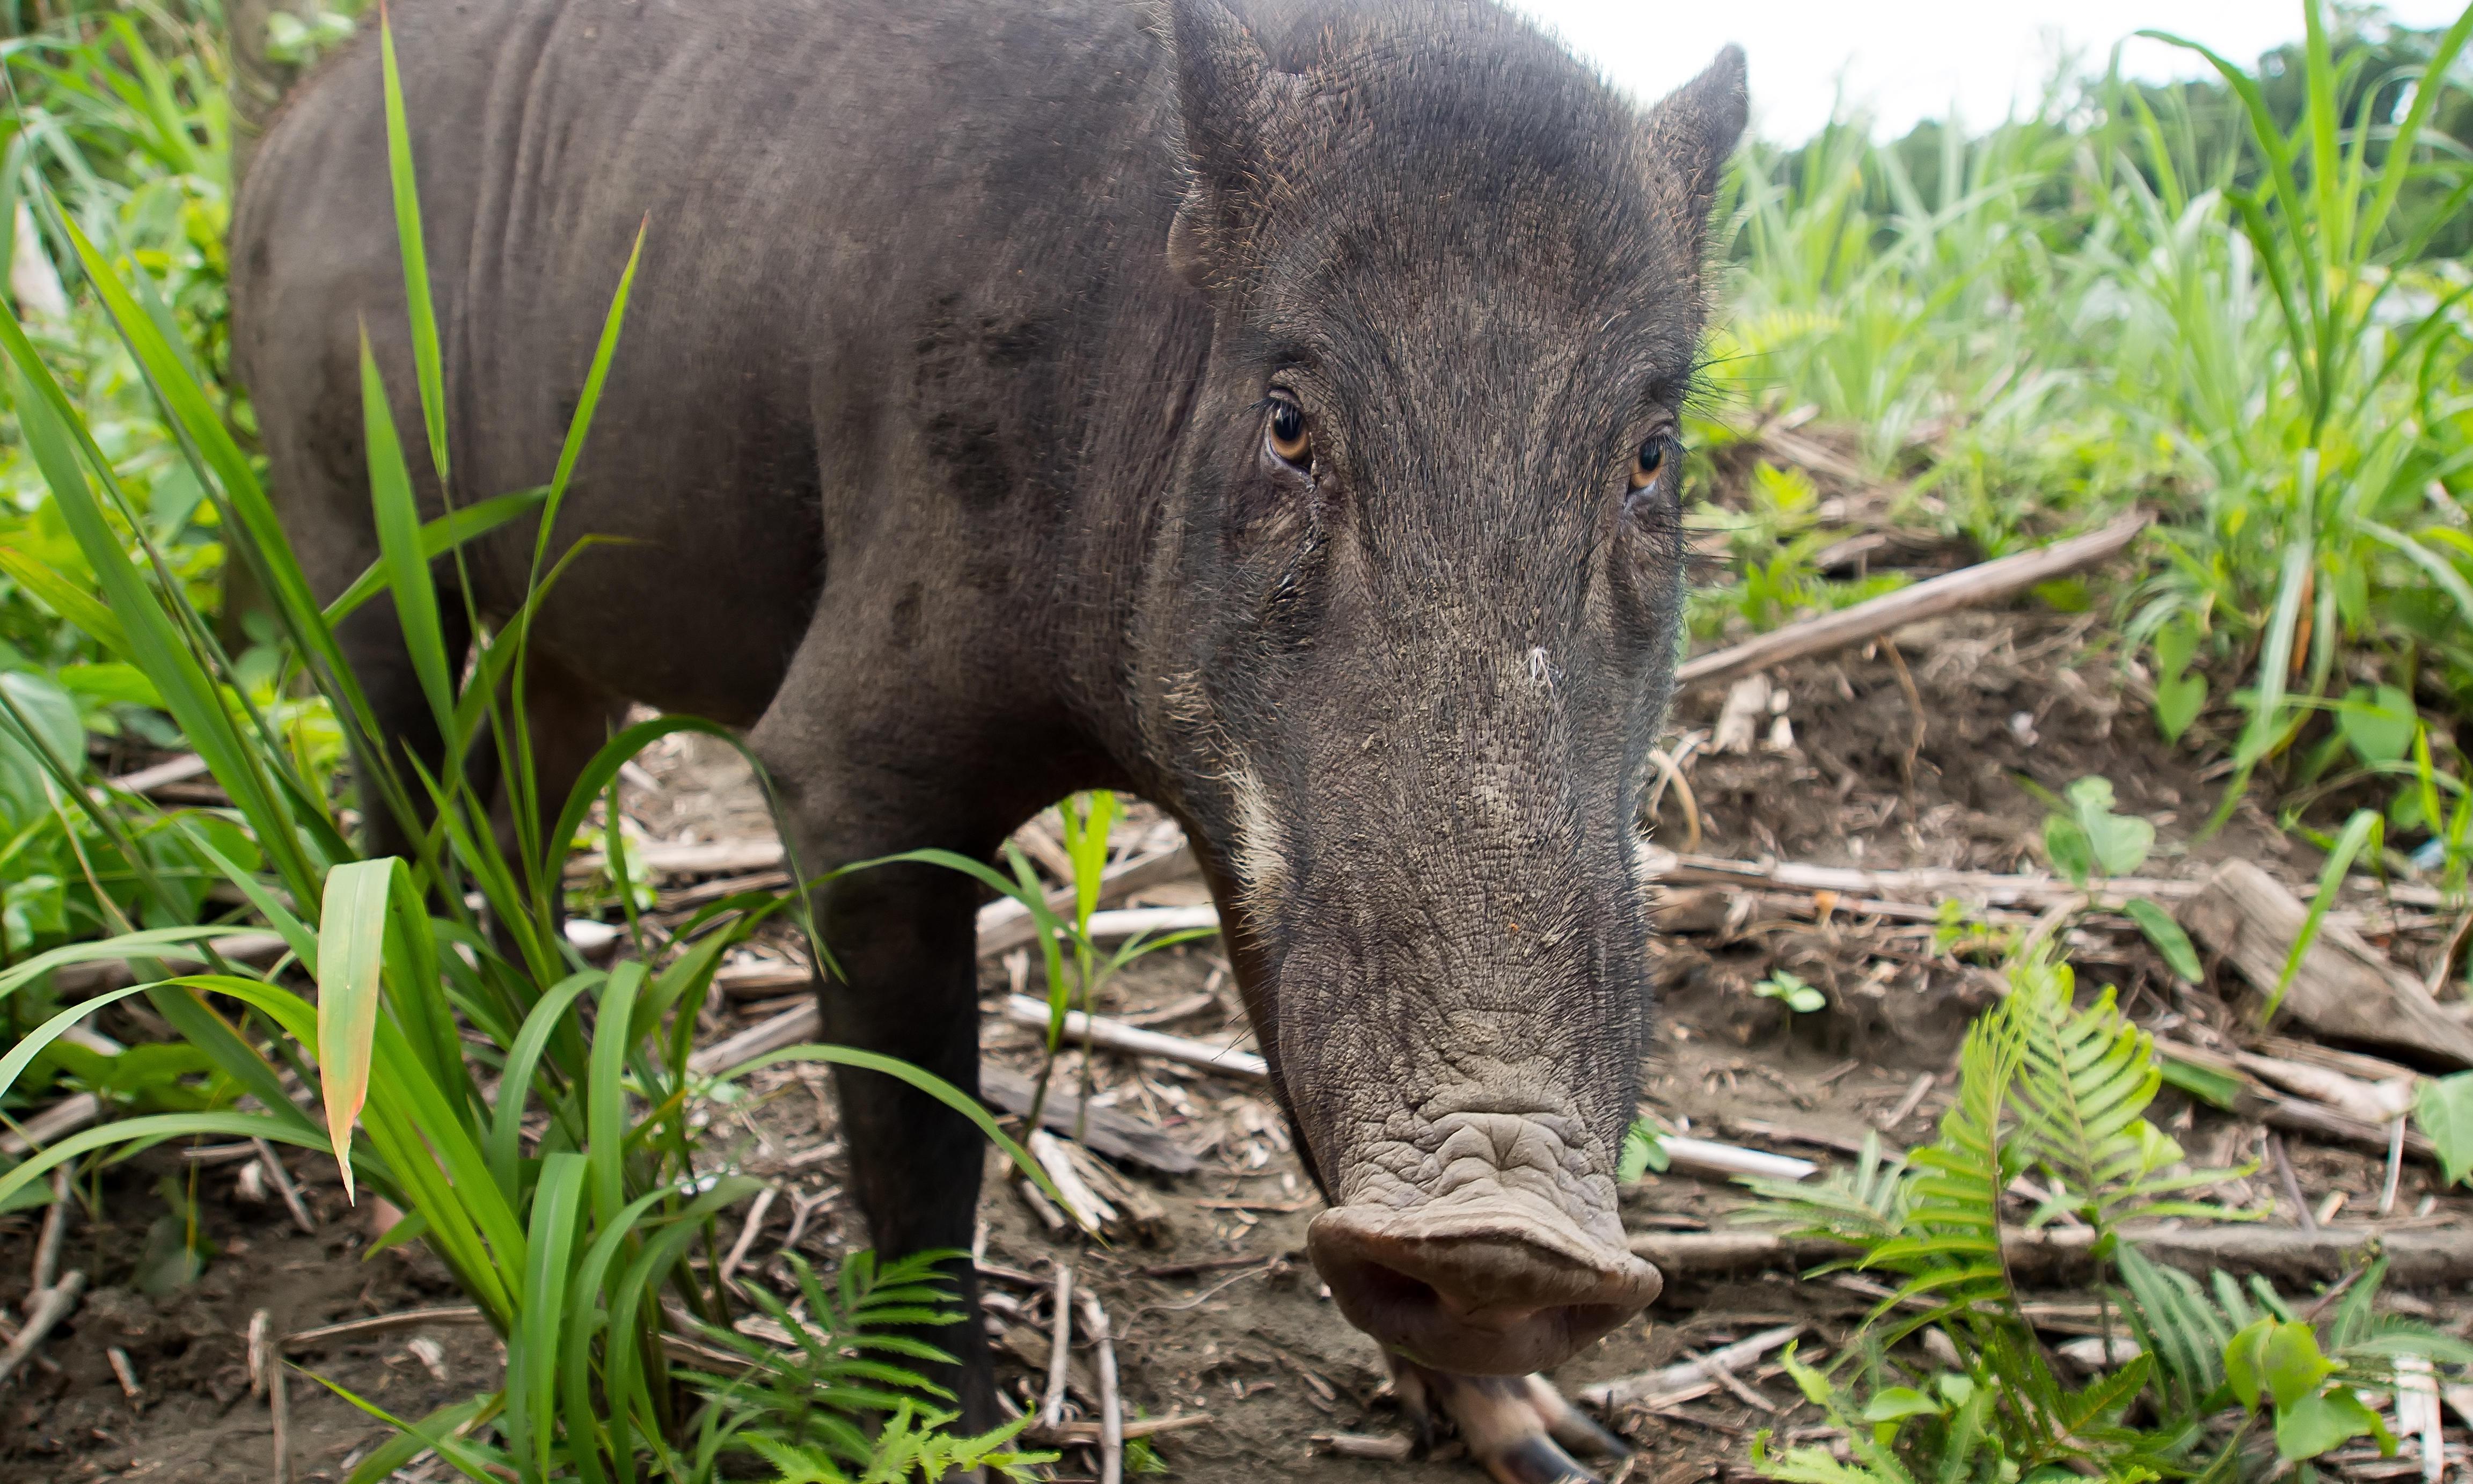 'Seaborne invasion' of wild boar swamps mystical Malaysian island